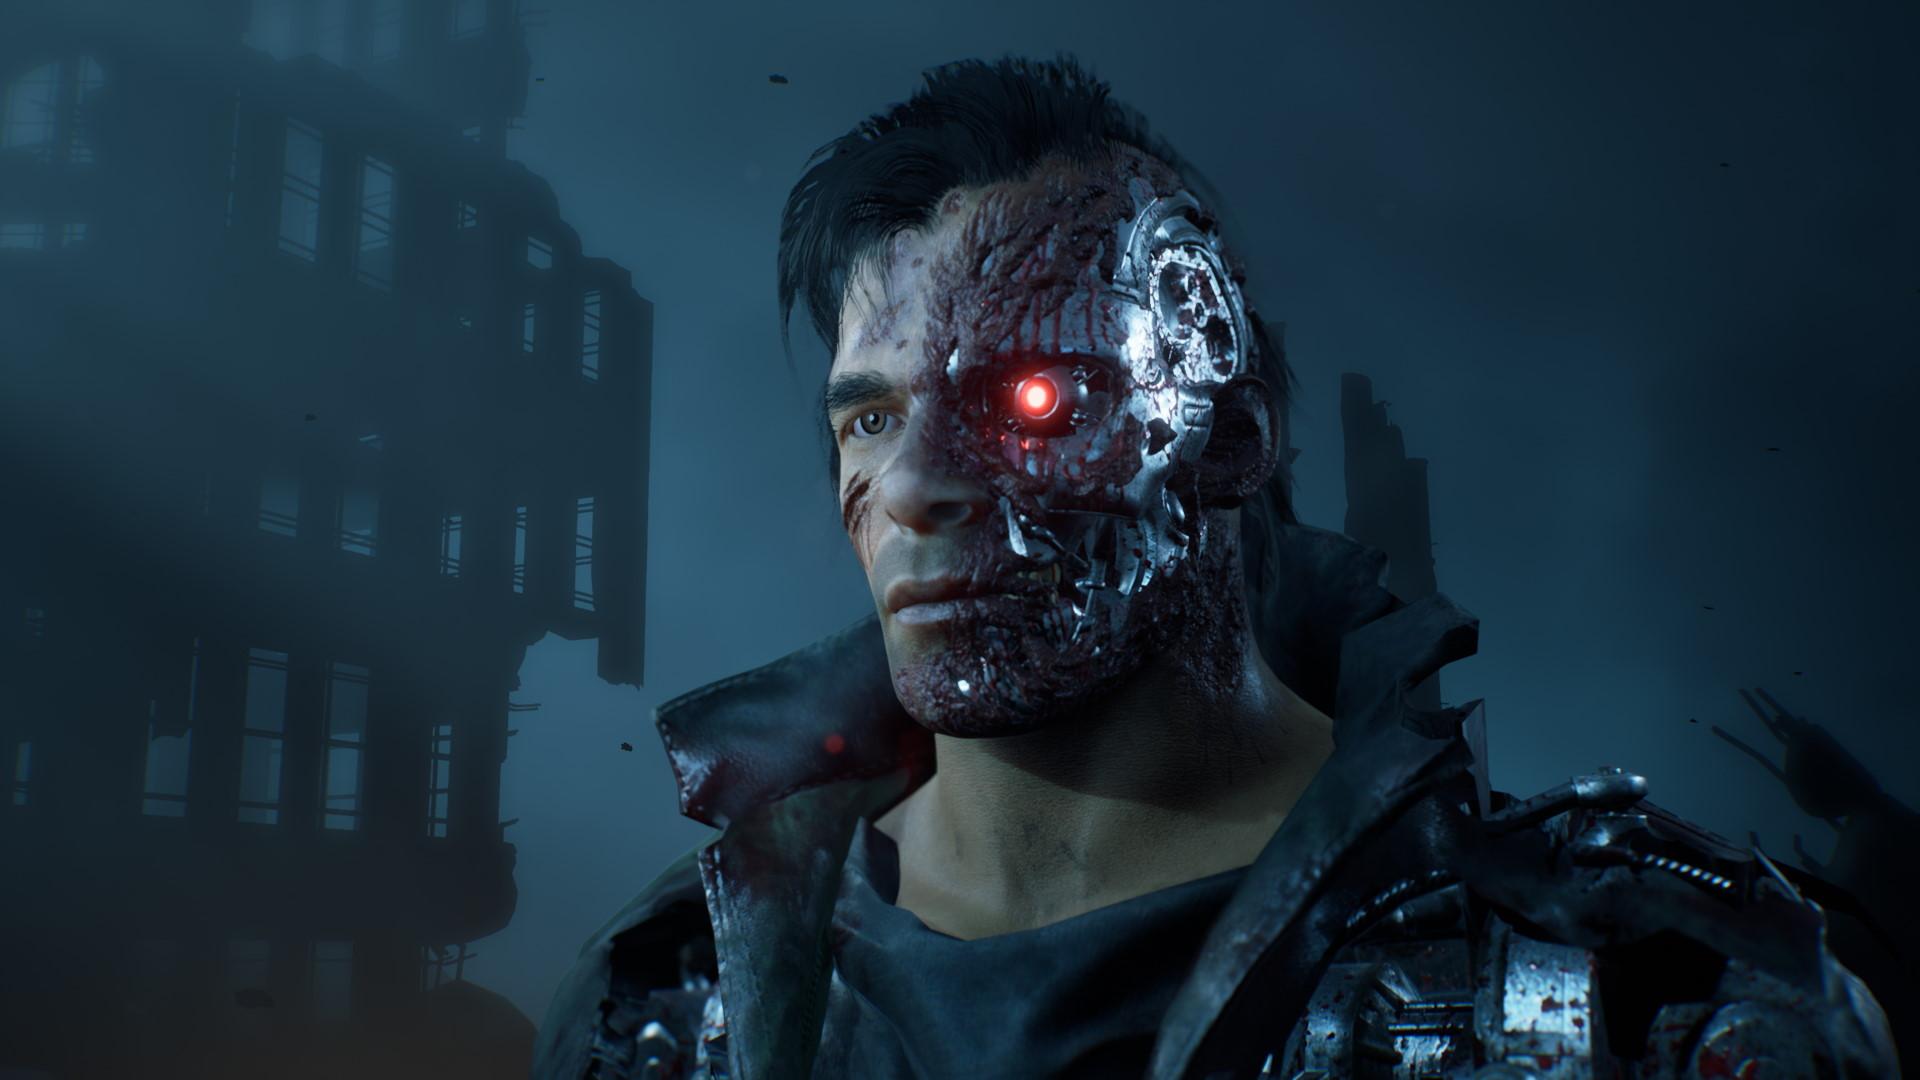 Terminator: Resistance - Enhanced brings better visuals and balance updates  to PS5 | GamesRadar+